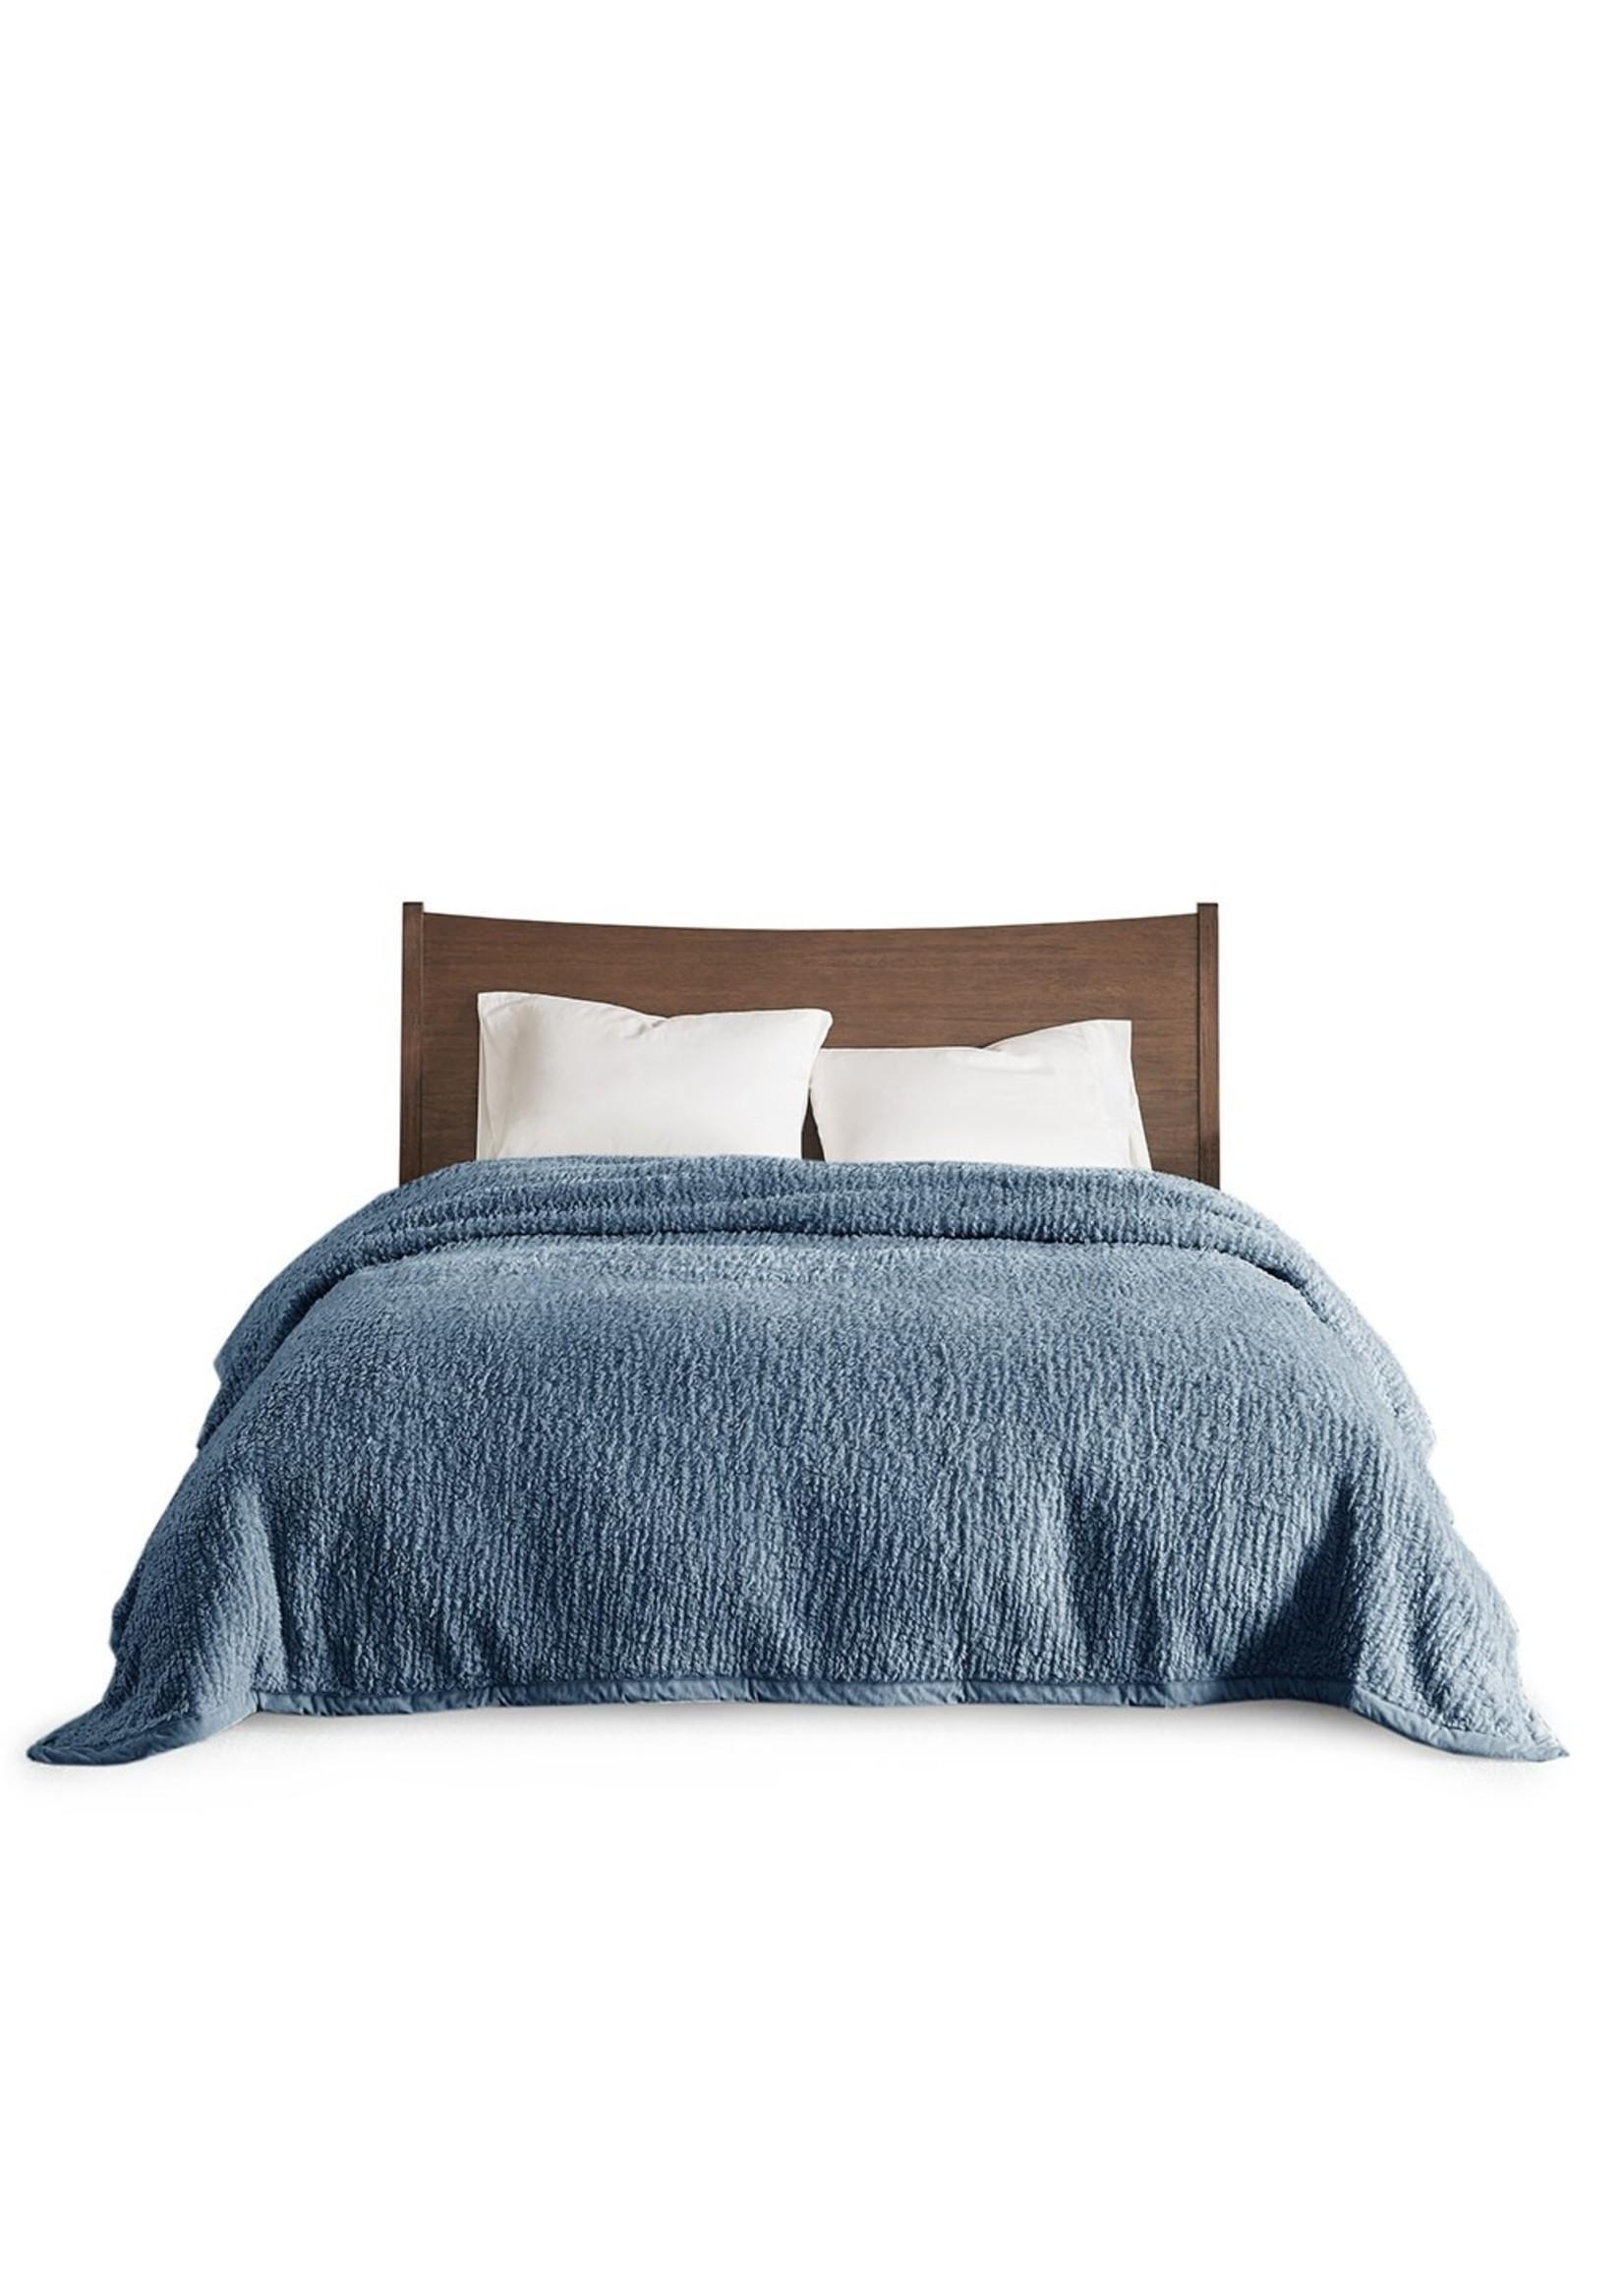 Olliix Blue Sherpa Blanket - King